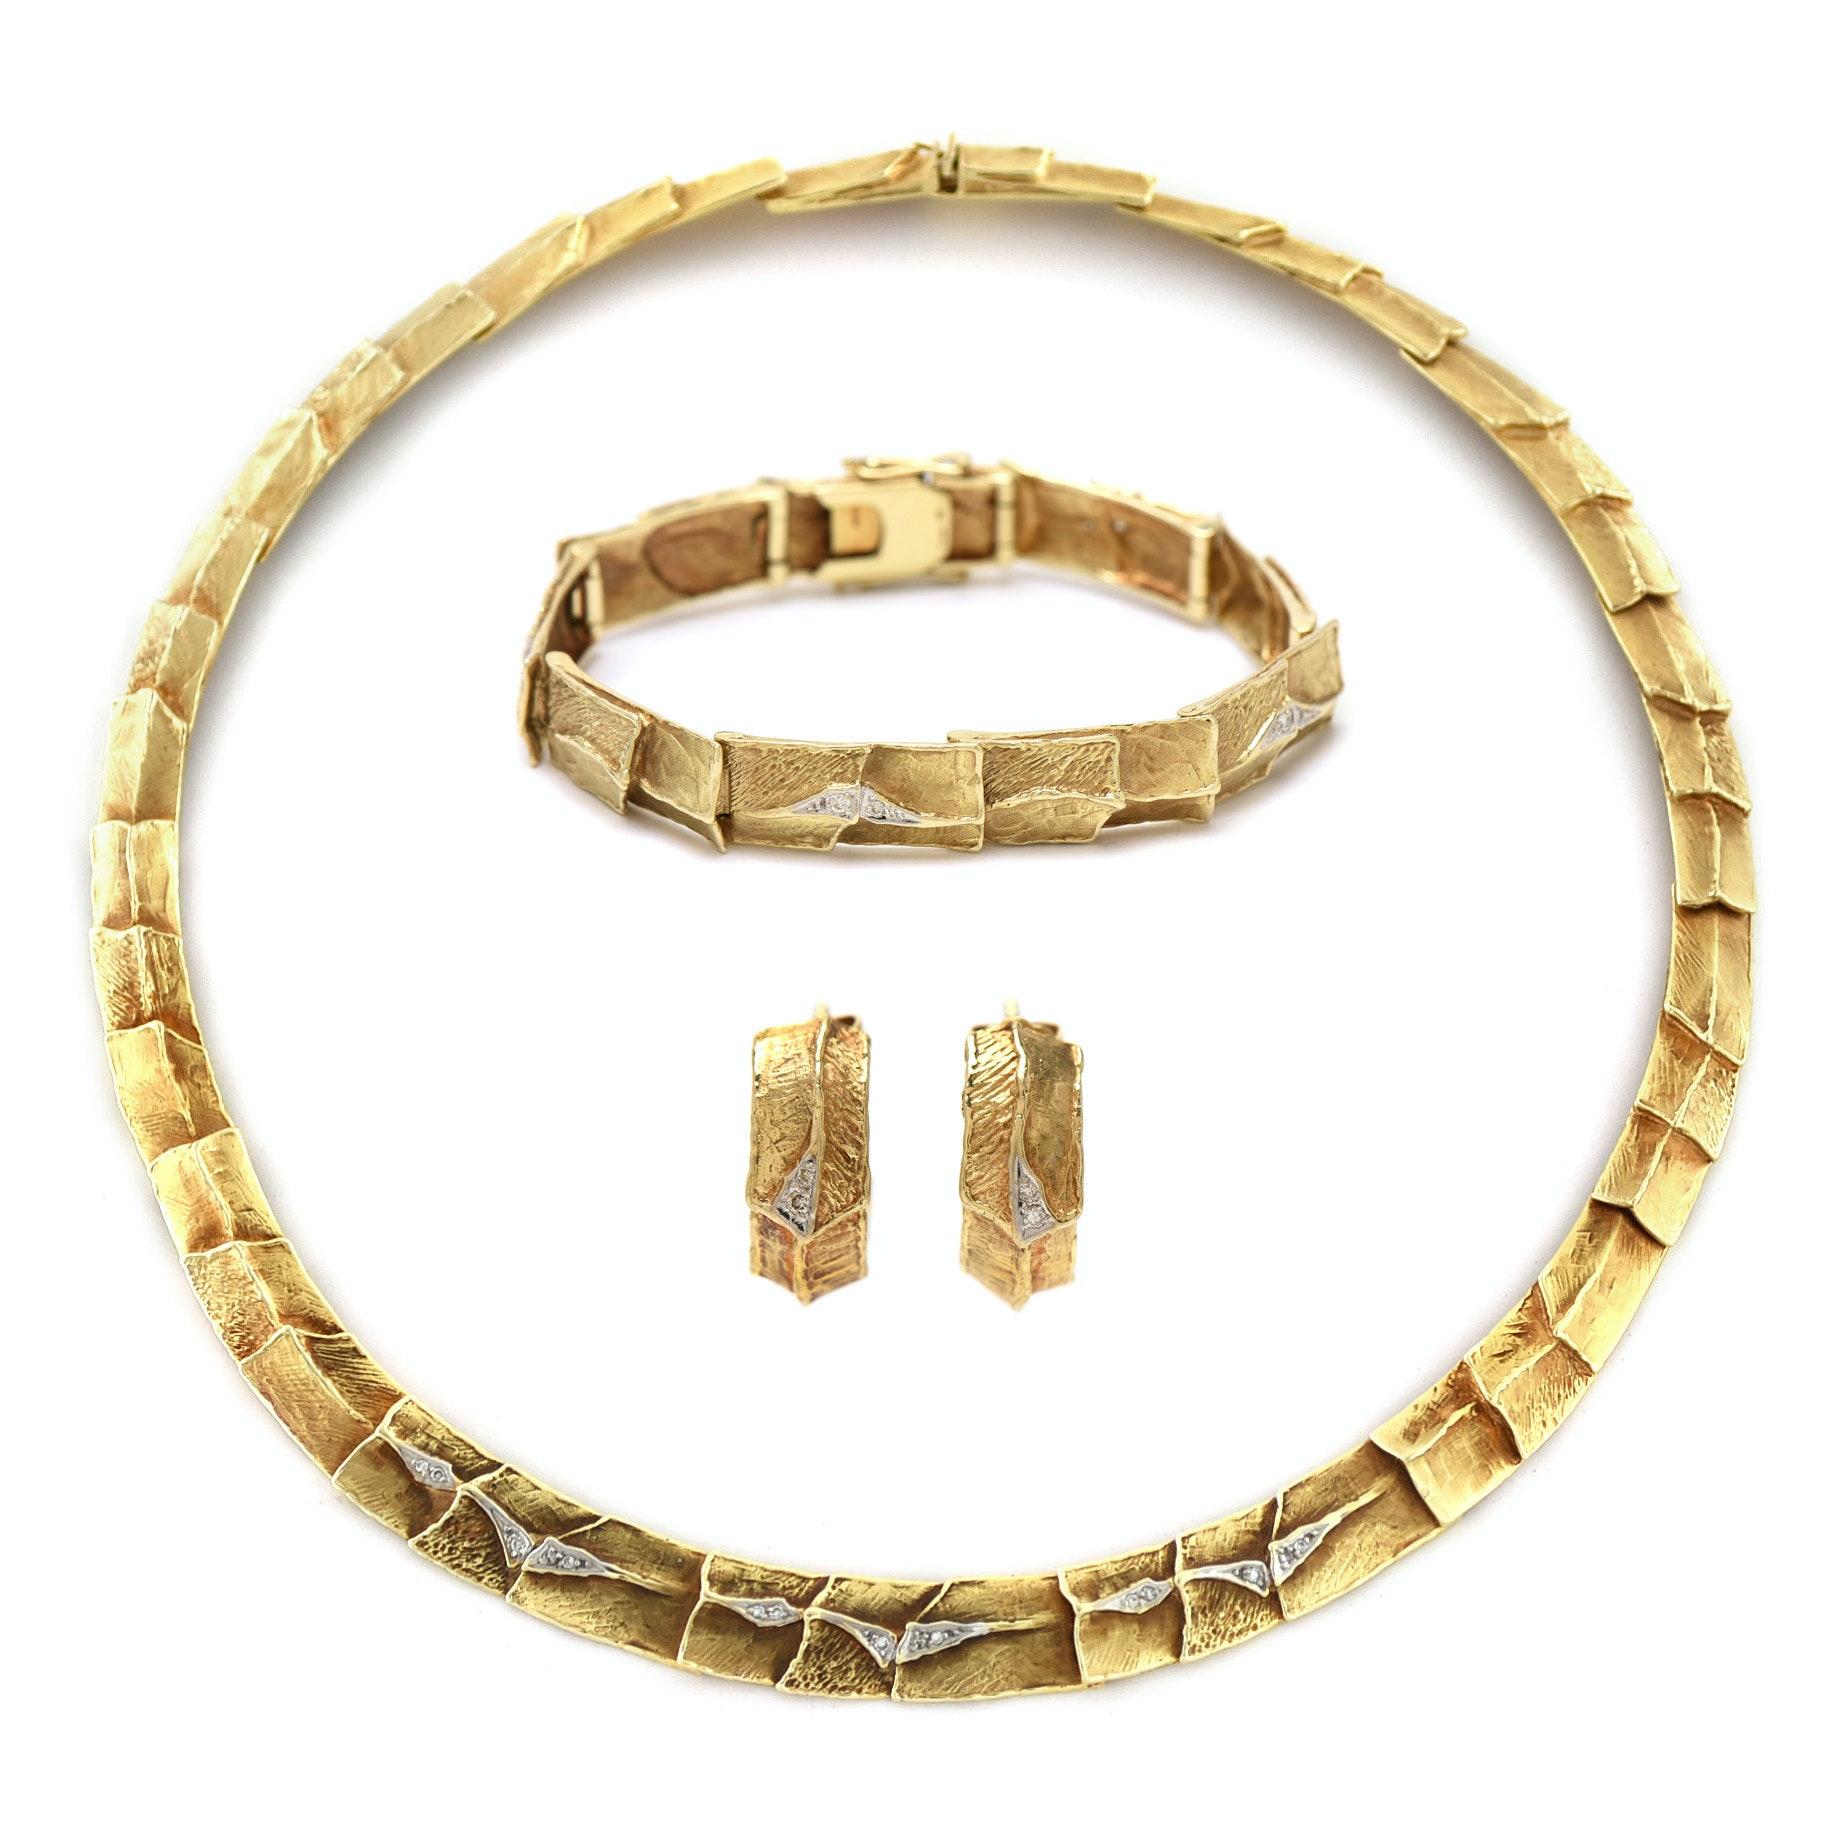 Vintage 14K Yellow Gold Diamond Necklace, Bracelet, and Earring Parure Set